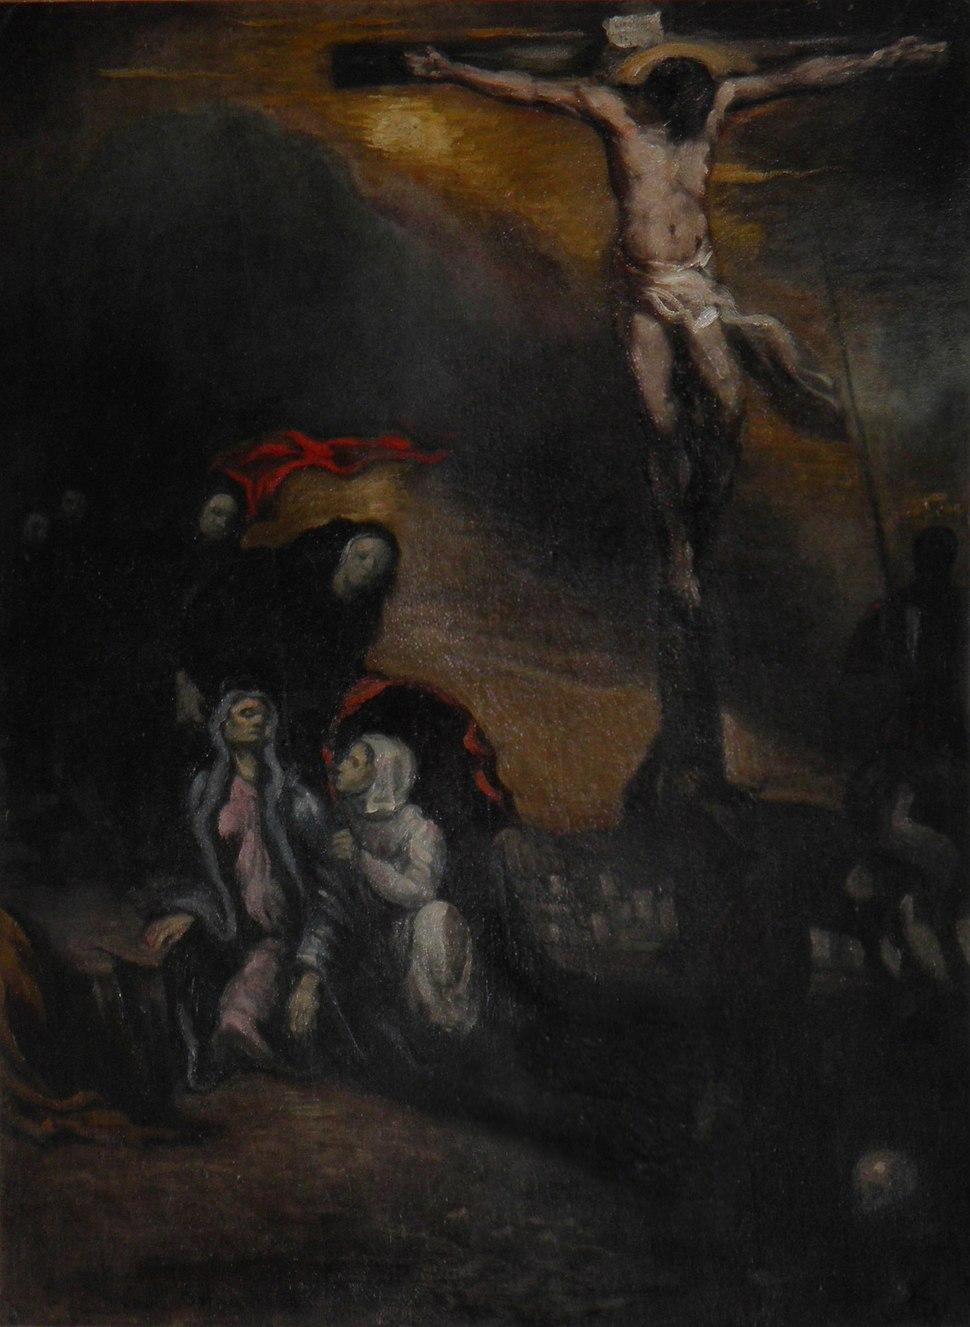 Crucifixion-1896